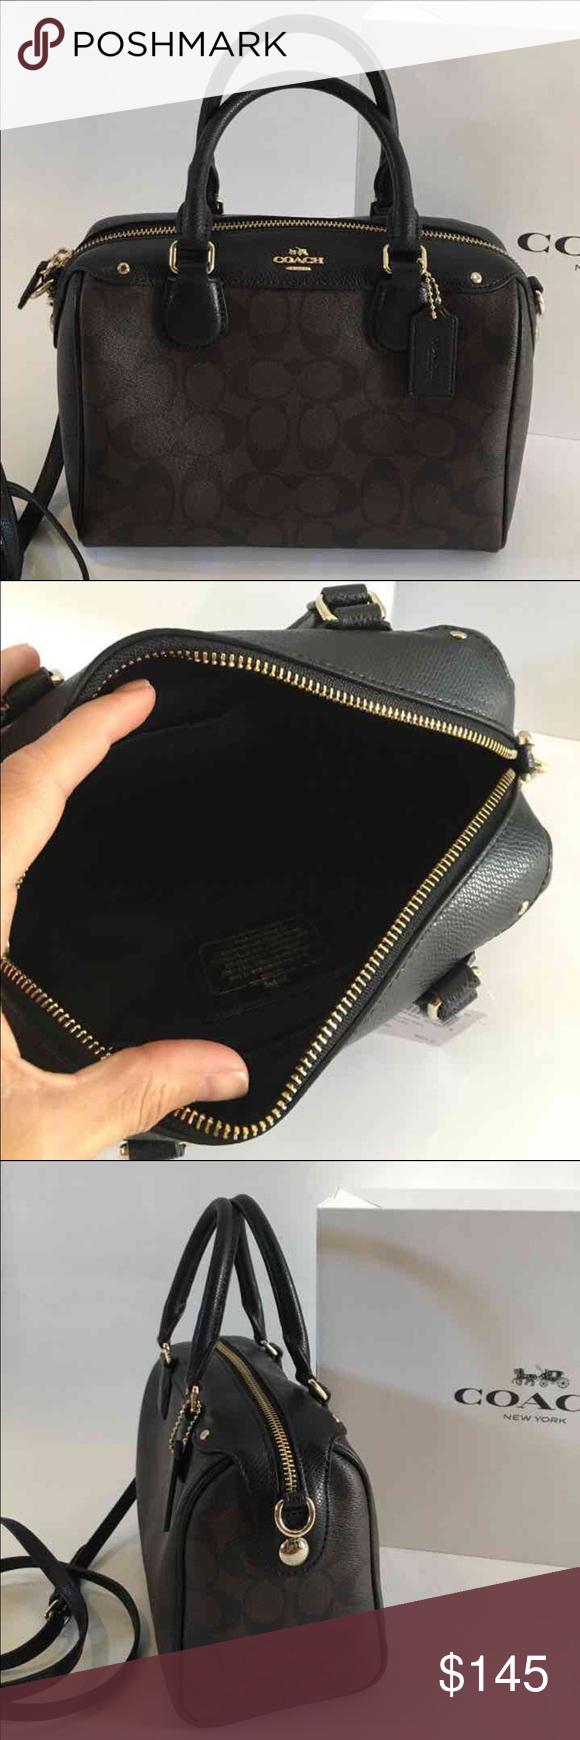 1c4c11e0b741 Coach Mini Bennett Satchel  Crossbody Beautiful brand new authentic Coach  Signature Mini Bennett Small handbag